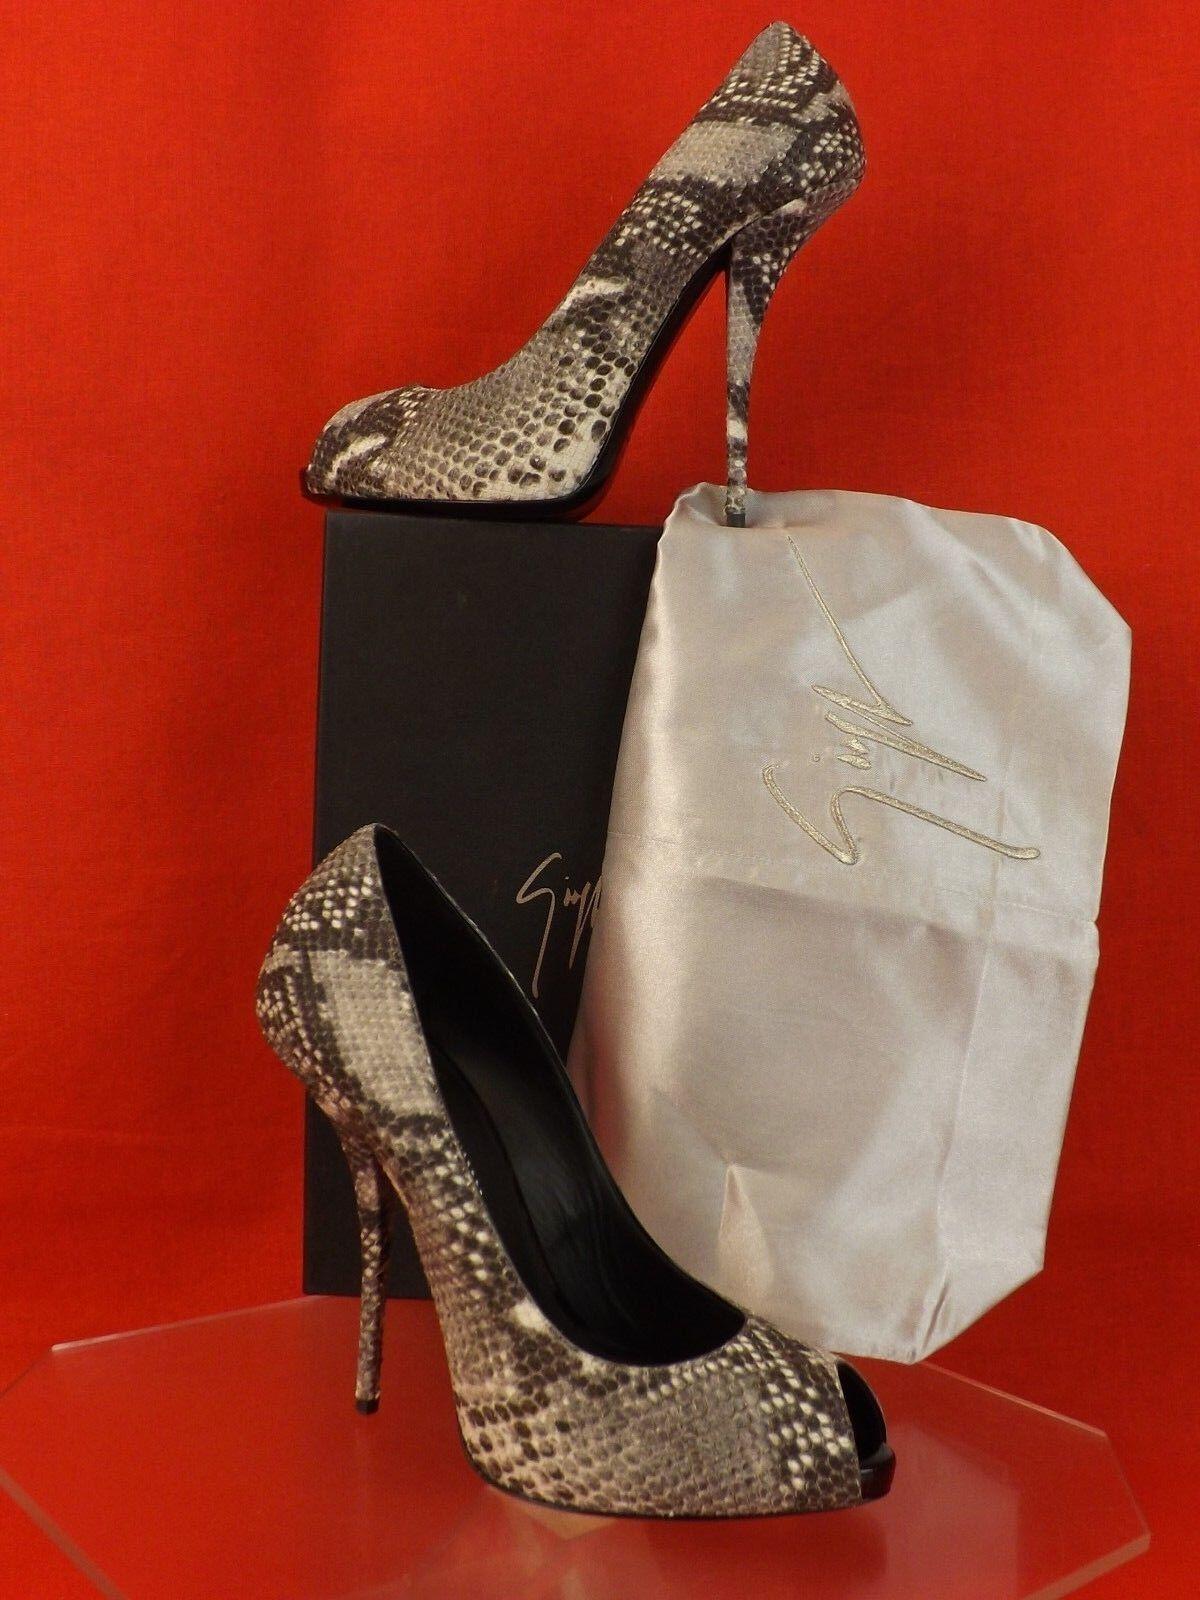 Nuevo En Caja Giuseppe Zanotti ceniza Python Cuero Cuero Cuero Peep Toe Nika Tacón Alto Zapatos De Salón 39.5  70% de descuento